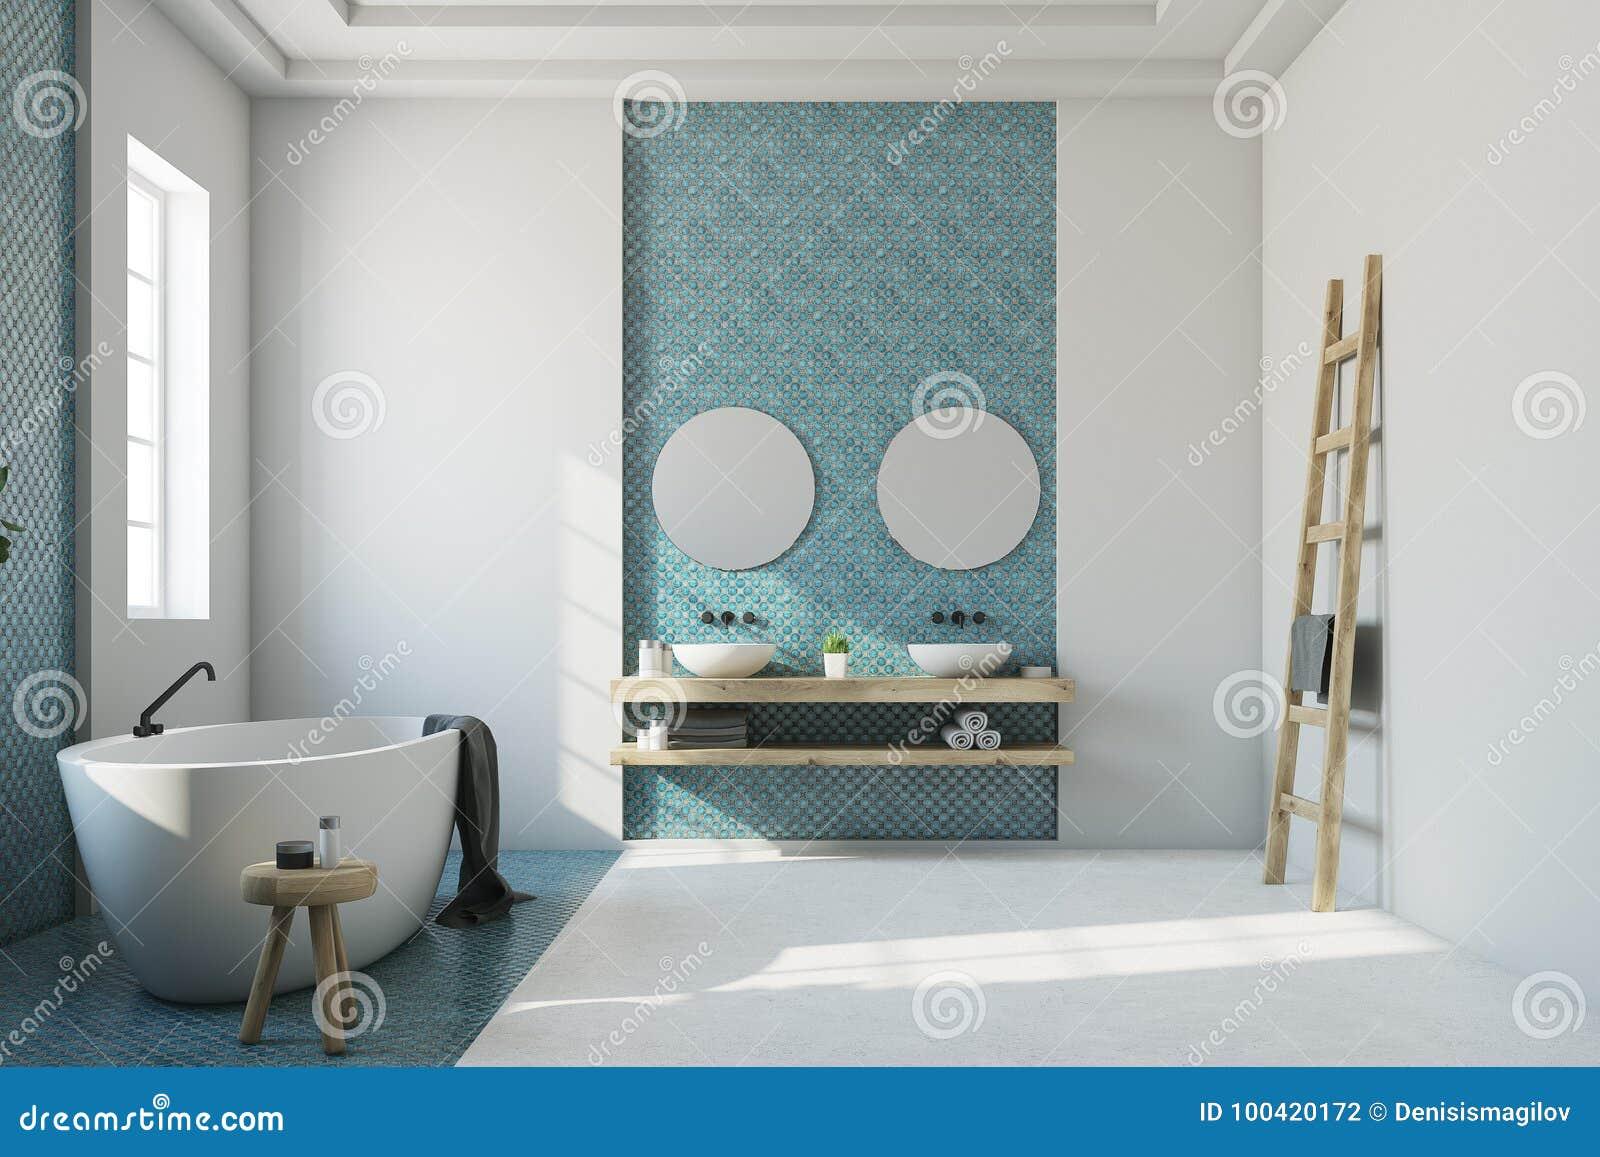 Blue And White Bathroom, White Tub, Sink Stock Illustration ...